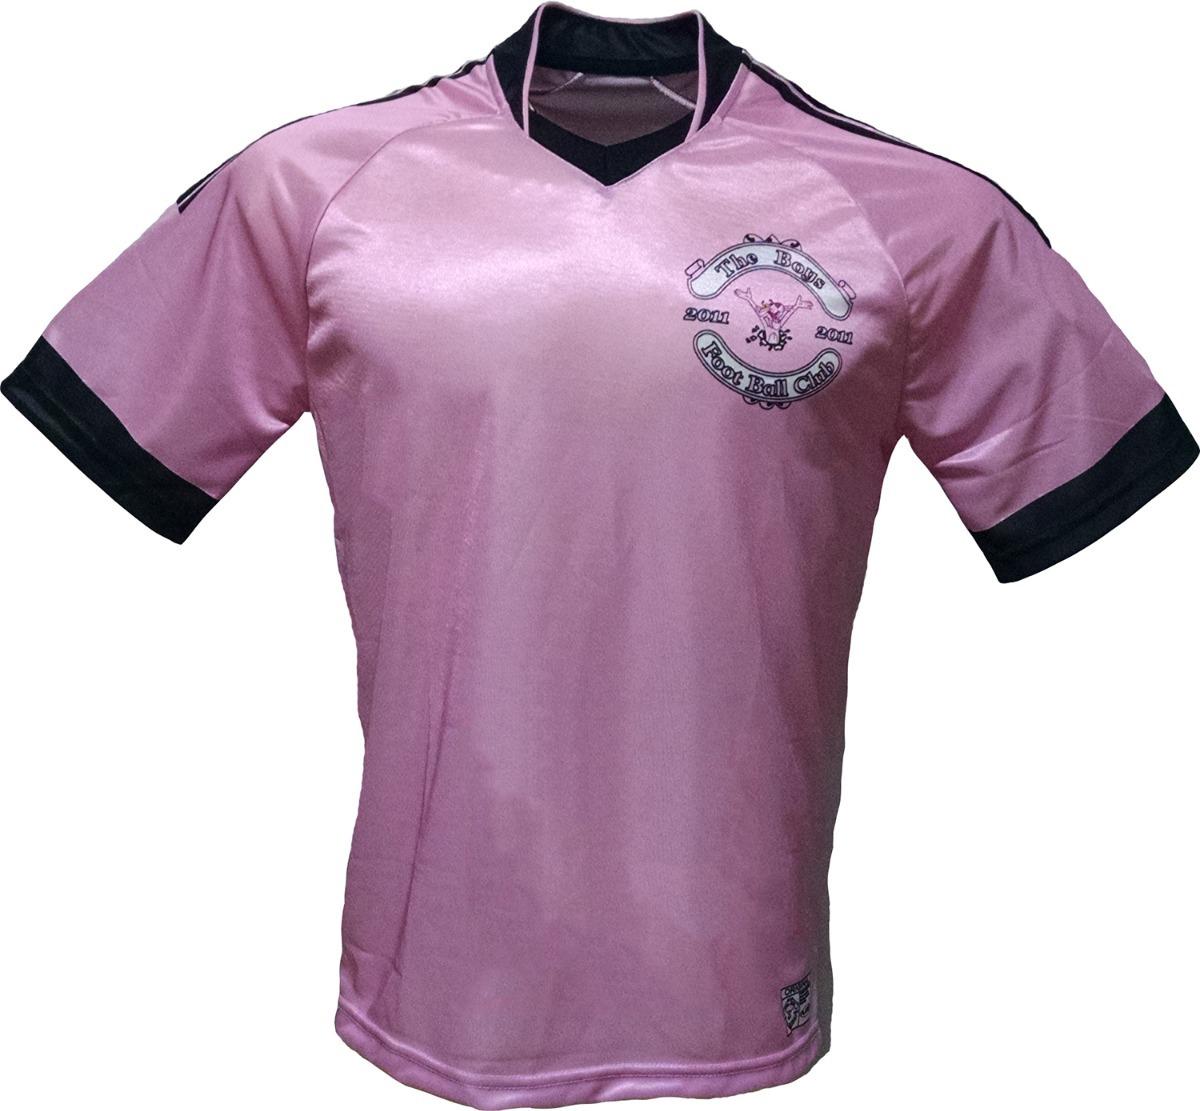 59db60eef5 15 camisa futebol personalizado time uniforme fardamento. Carregando zoom.